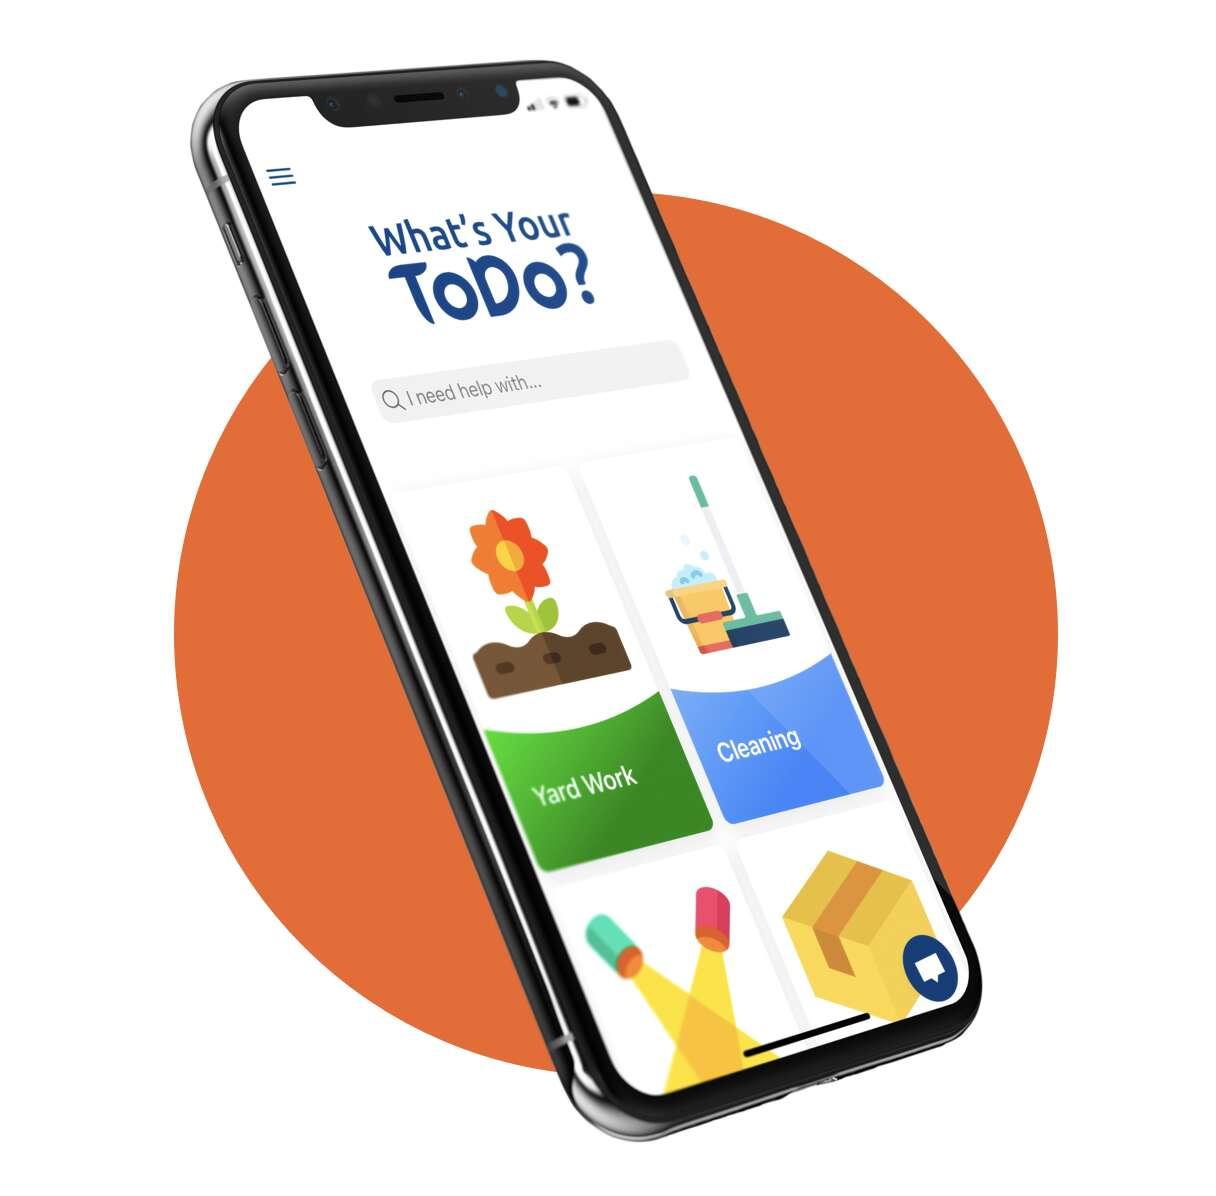 ToDoolie App Example